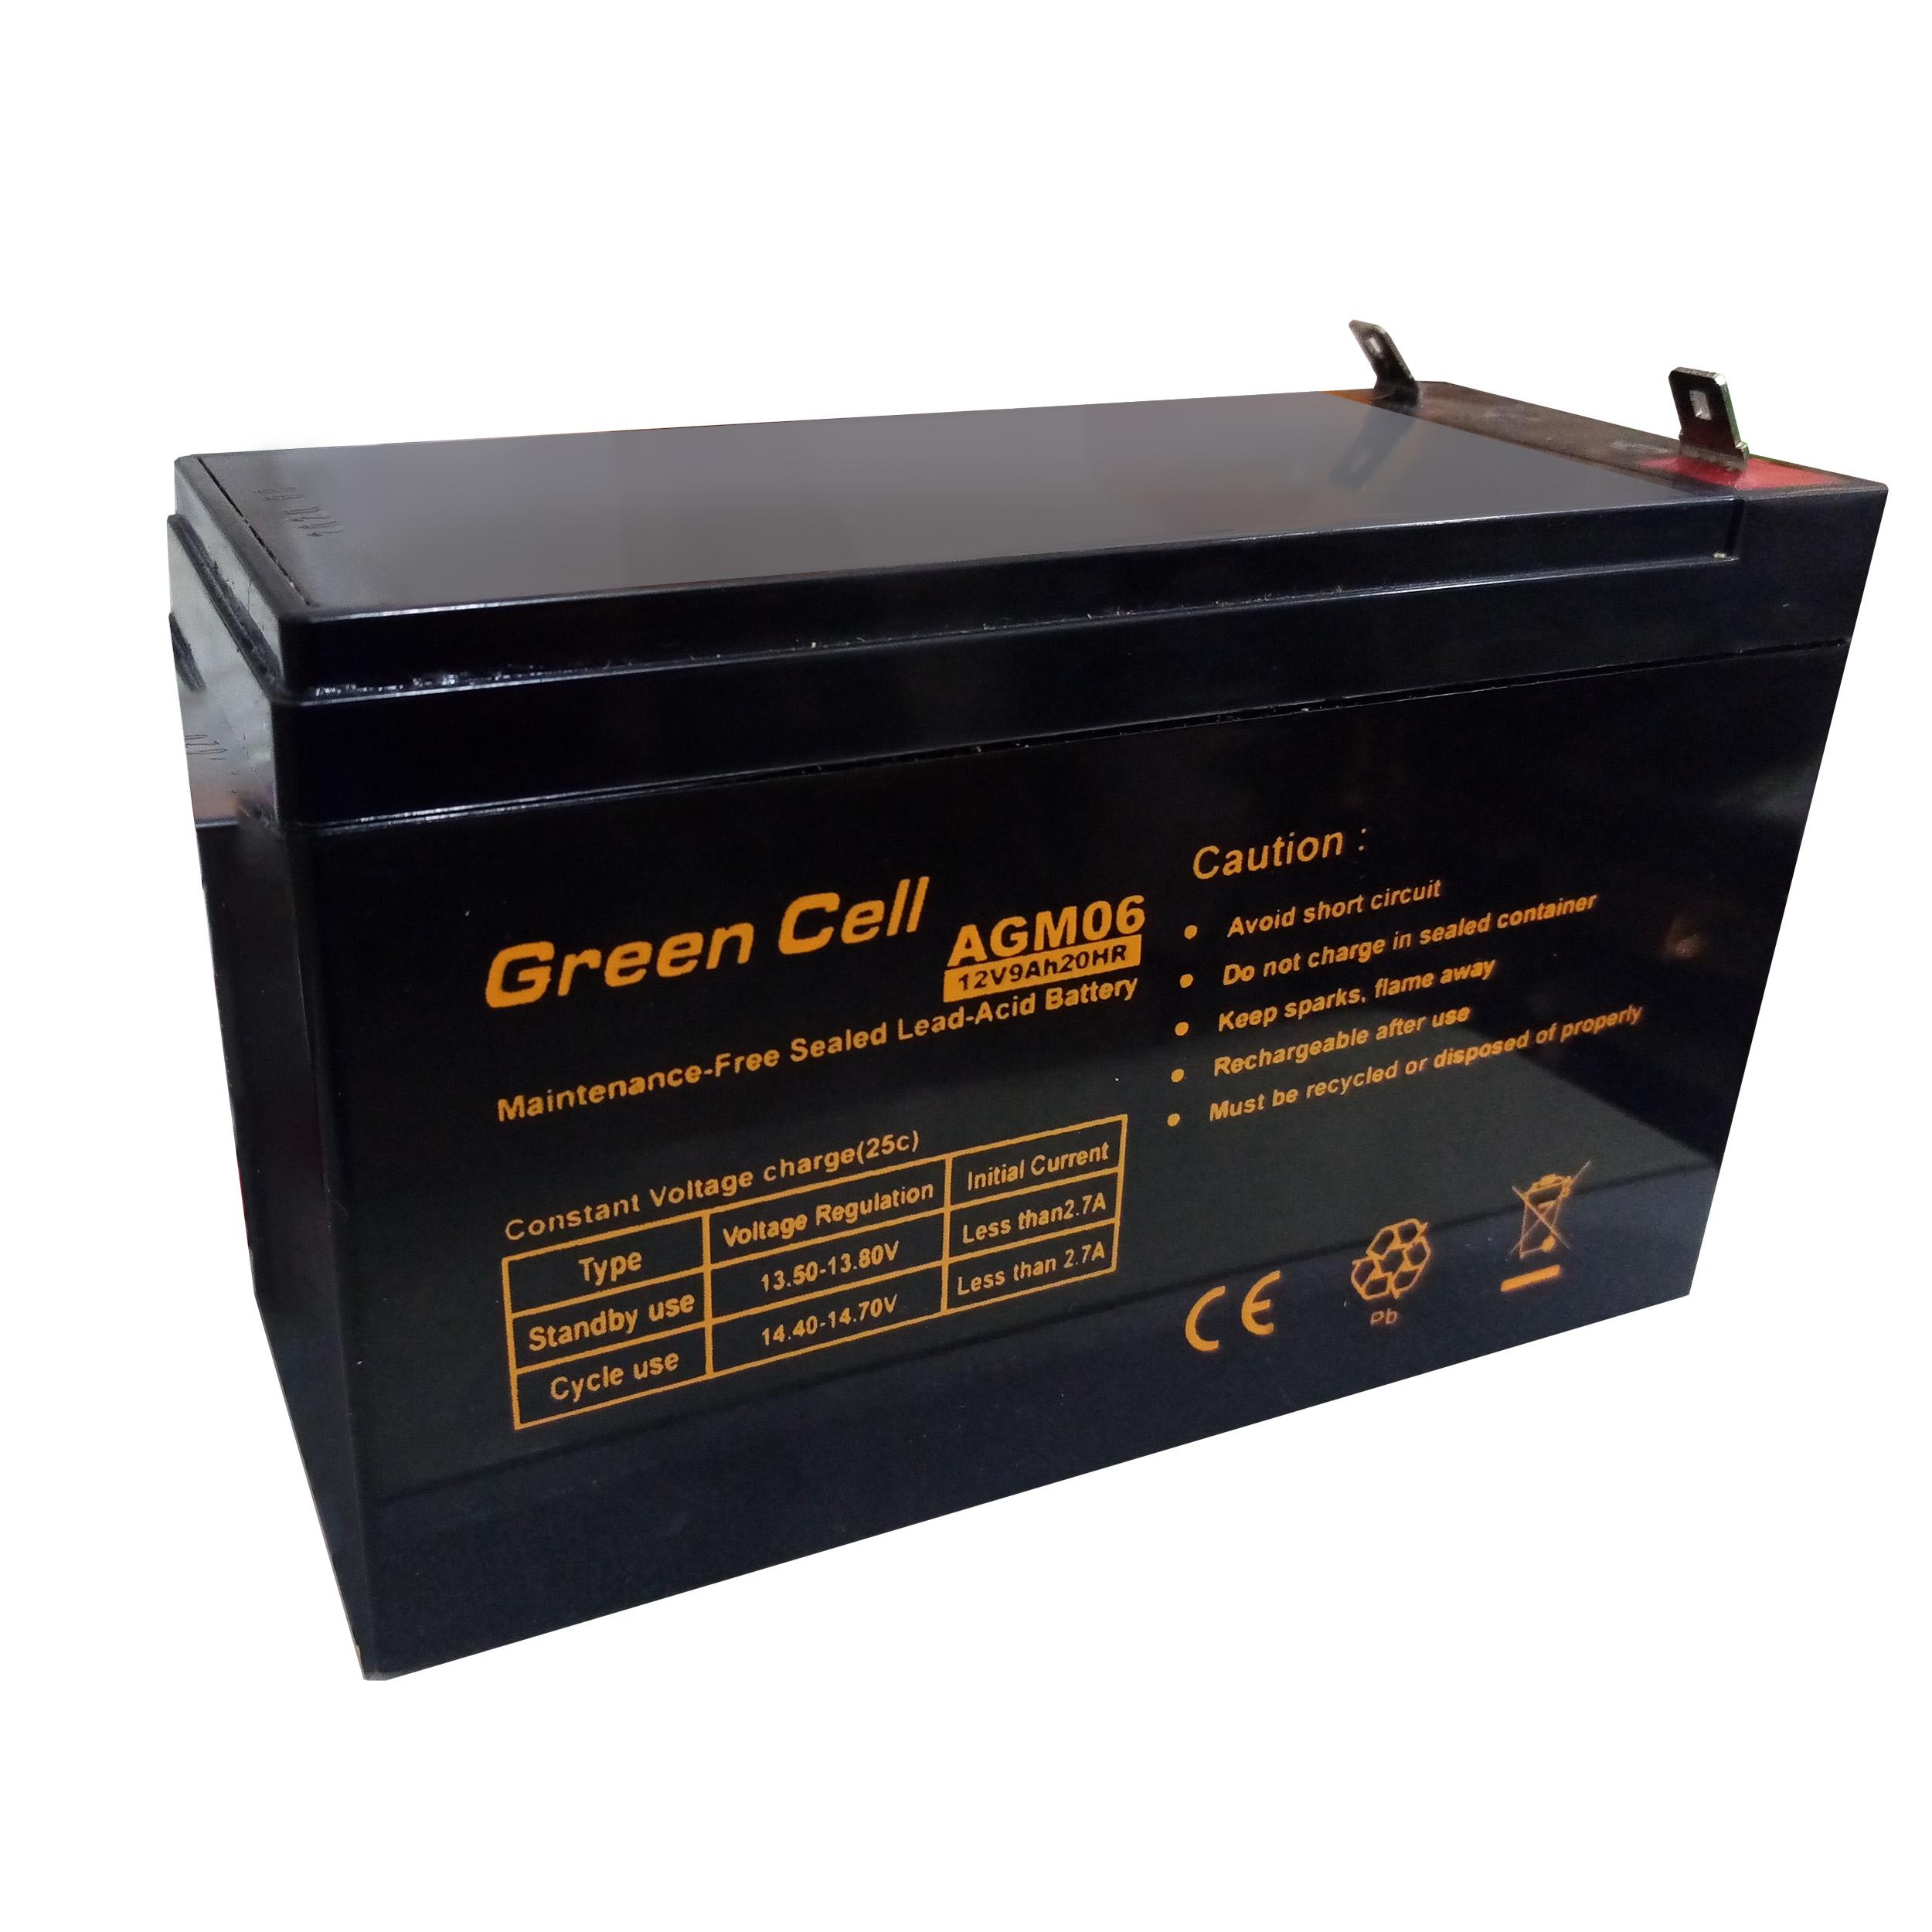 باتری یو پی اس 12 ولت 9 آمپر ساعت گرین سل مدل GC-9Ah